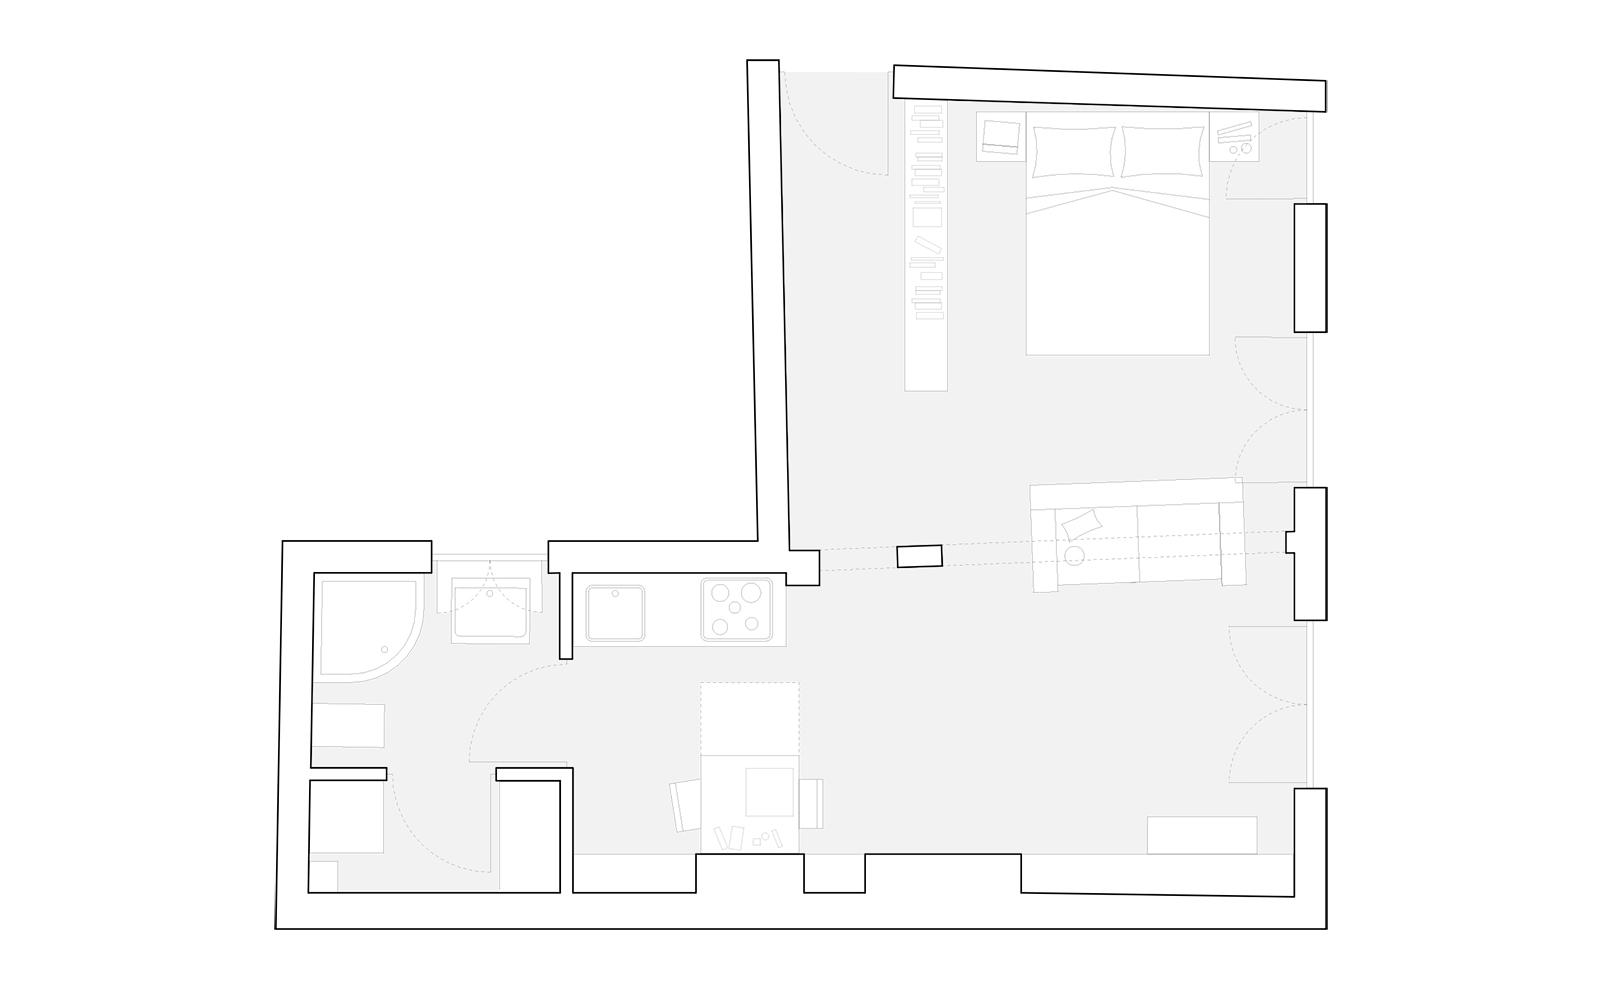 Salle De Bain Petit Espace Plan ~ bruno egger mazzoleni architetti associati